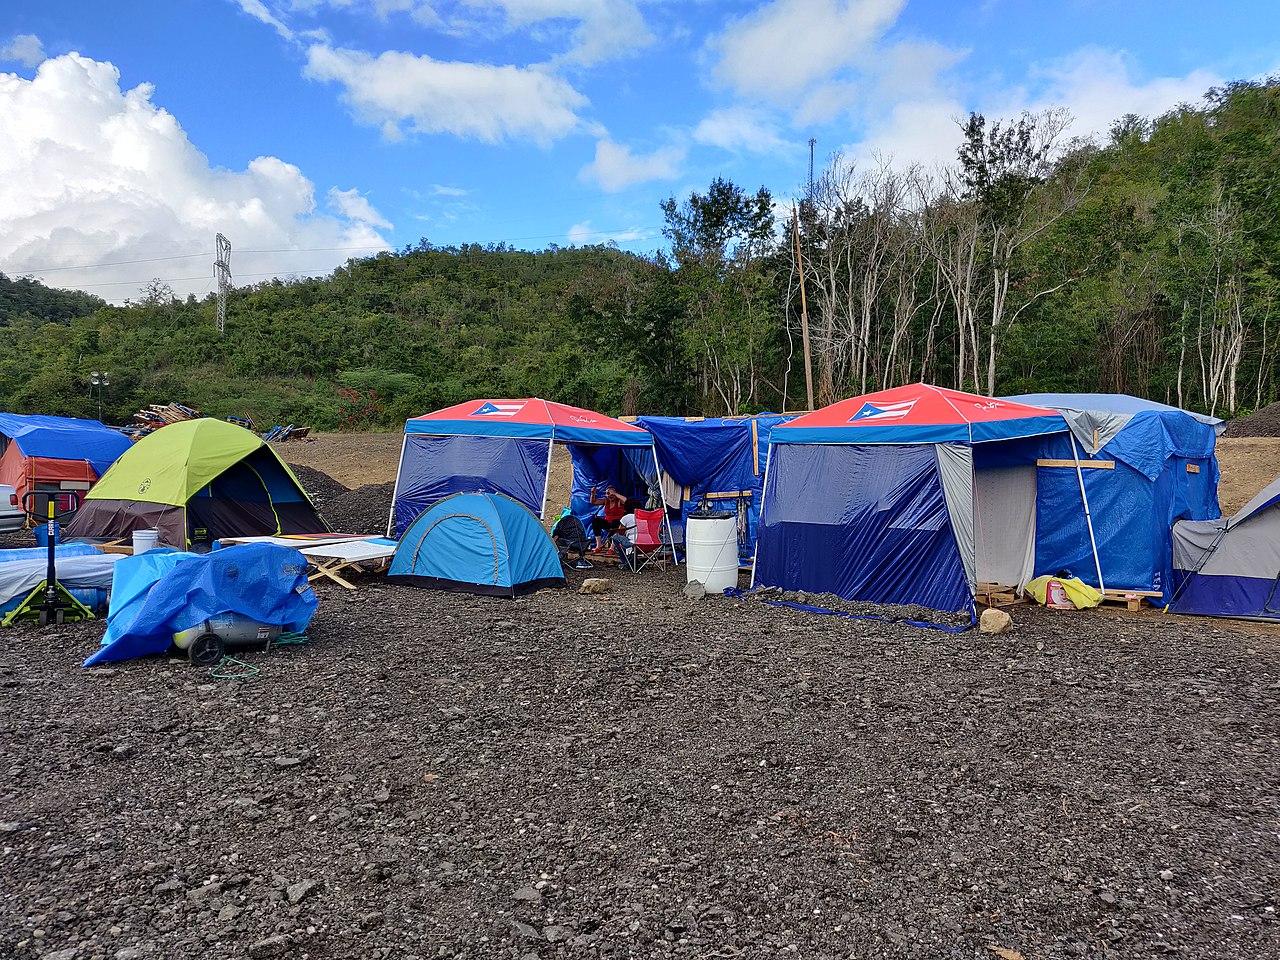 Puerto Rico quakes continue; Keys for Kids sends hope, encouragement